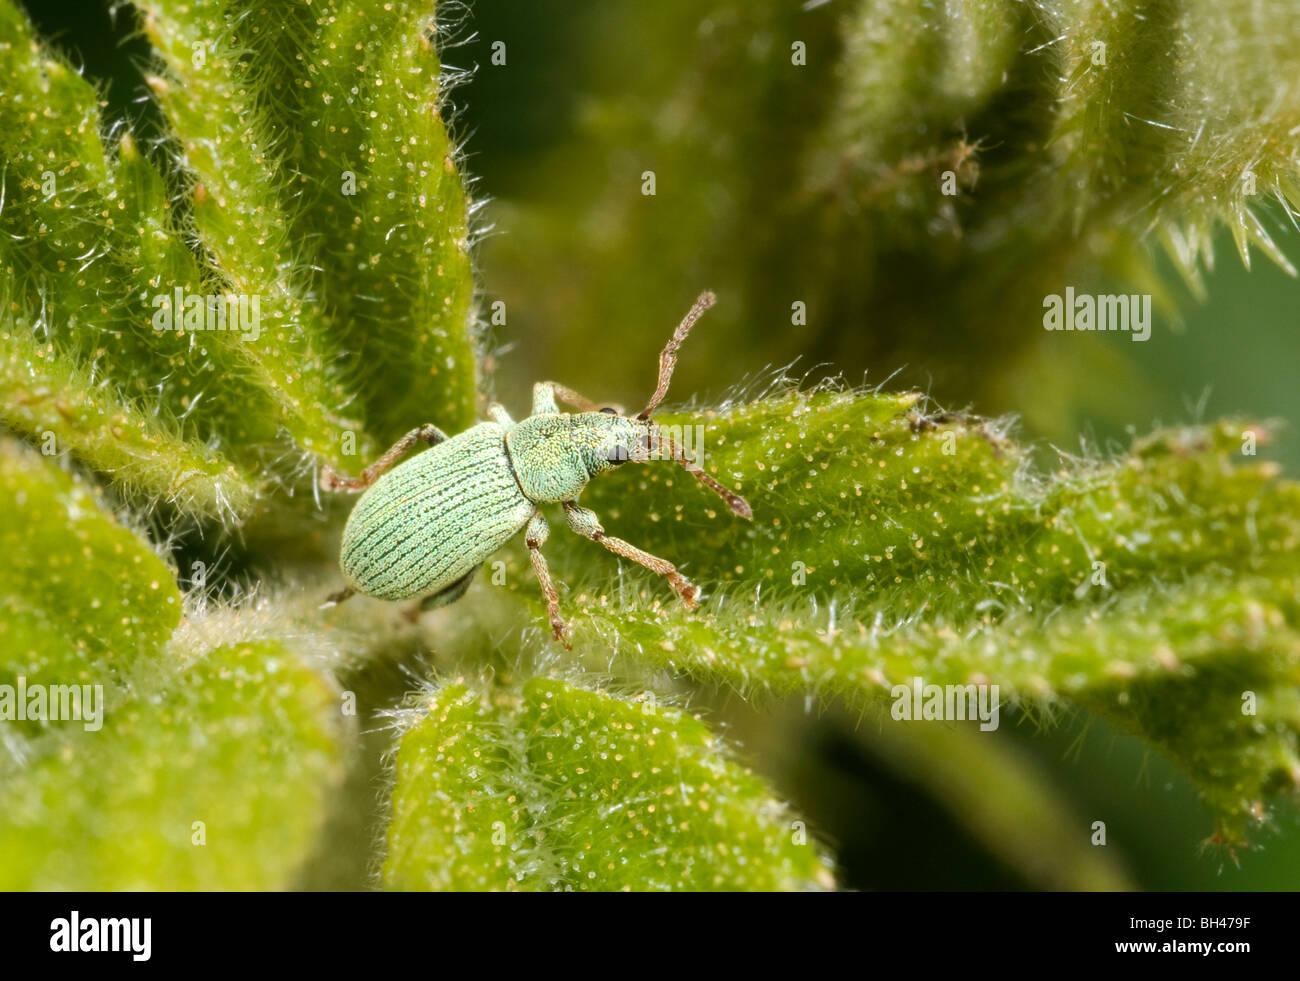 Rüsselkäfer (Phyllobius Pomaceus). Junger Erwachsener mit grünen Schuppen intakt. Stockfoto